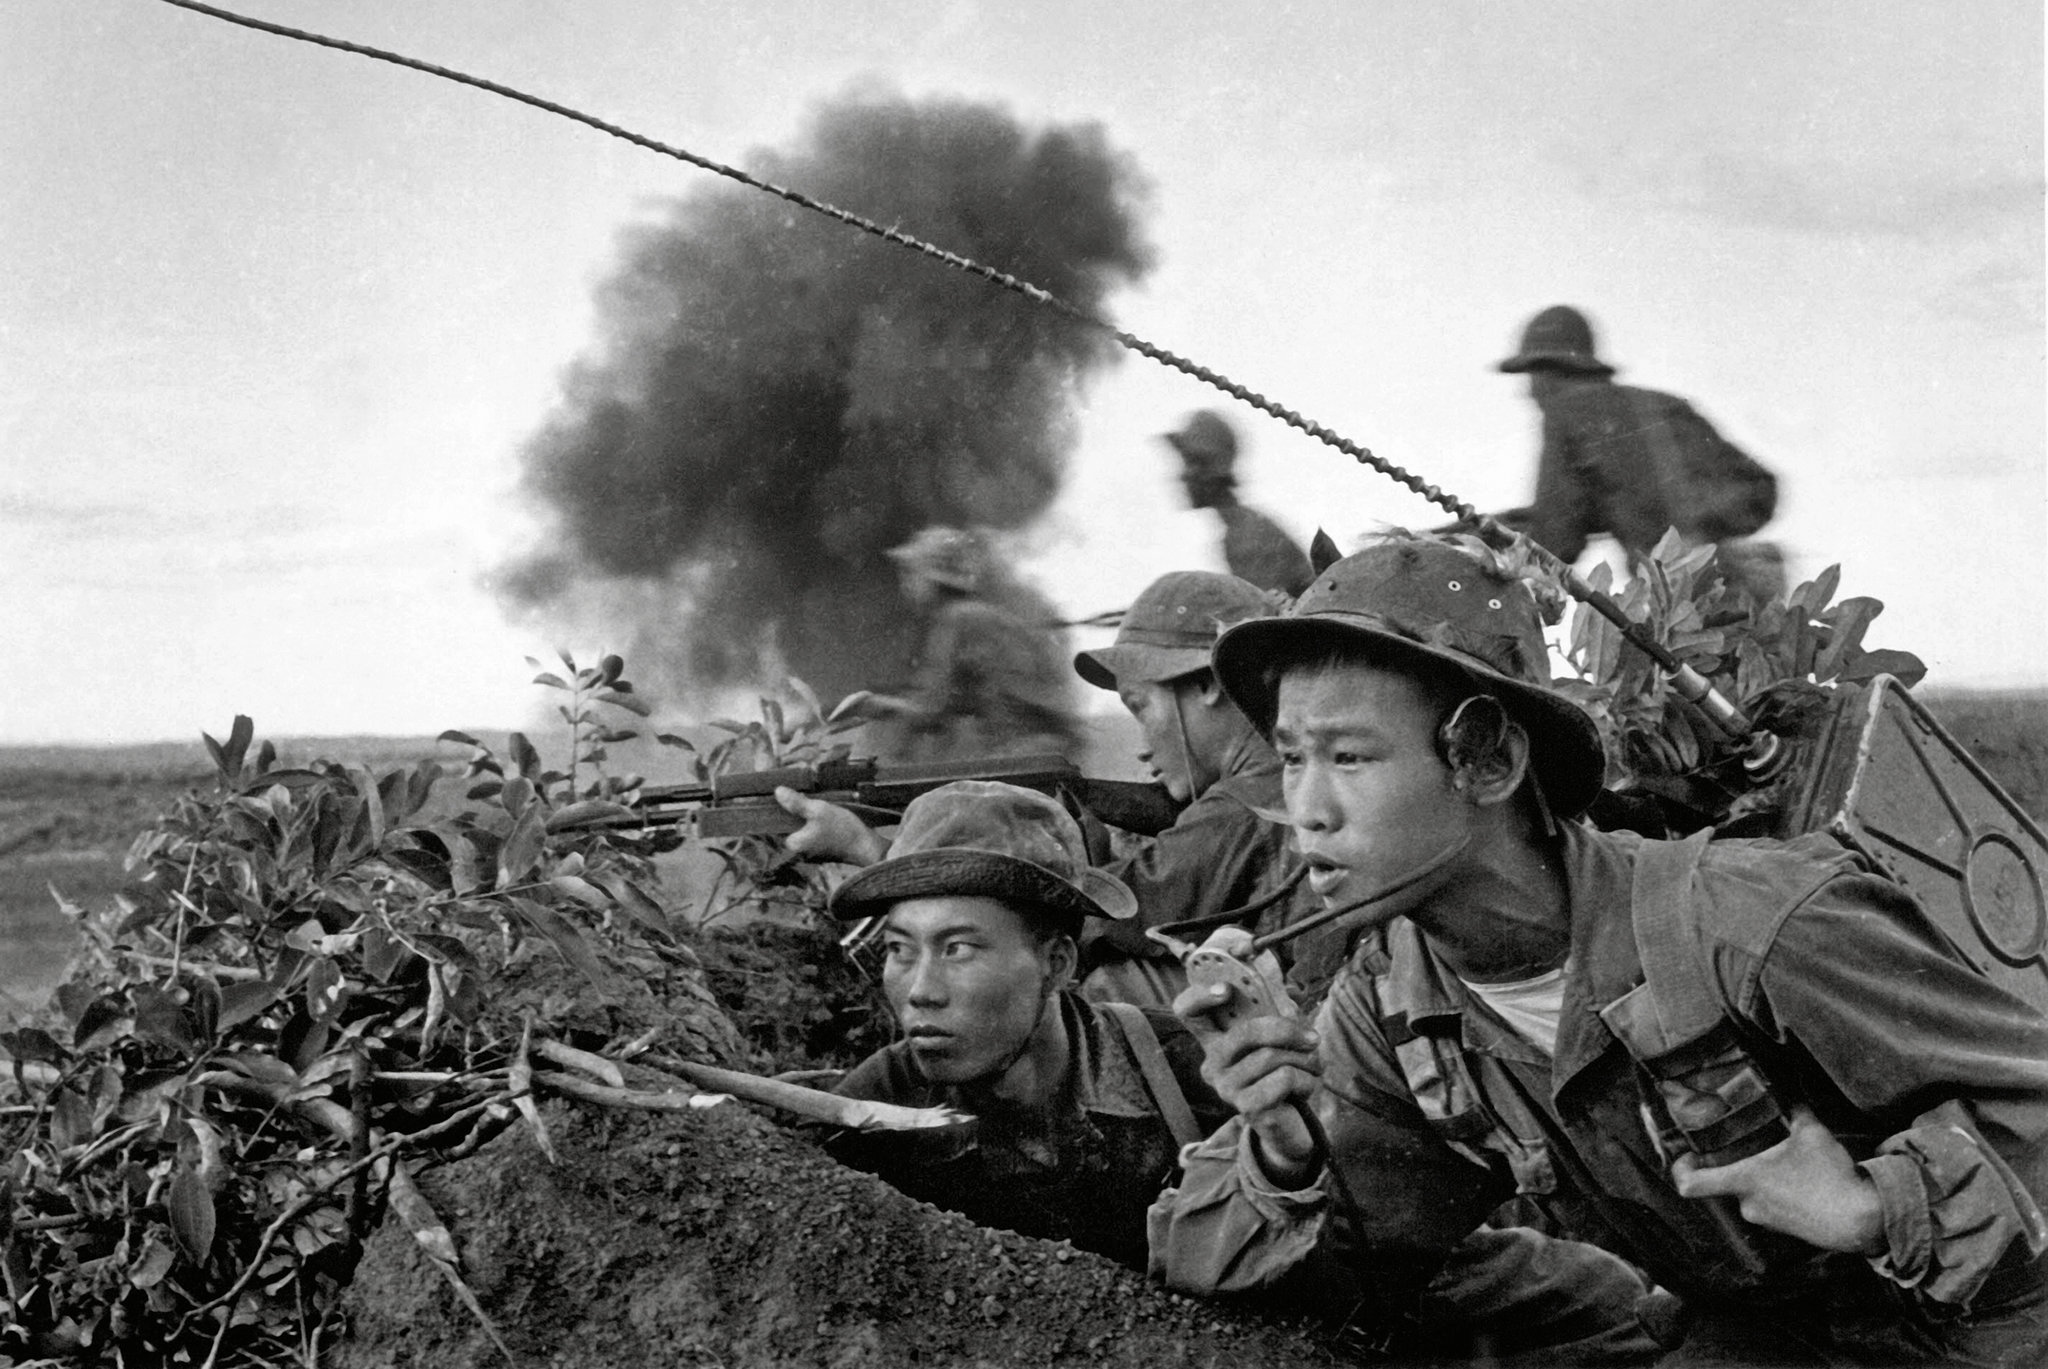 Questions Raised About Vietnam War Photos